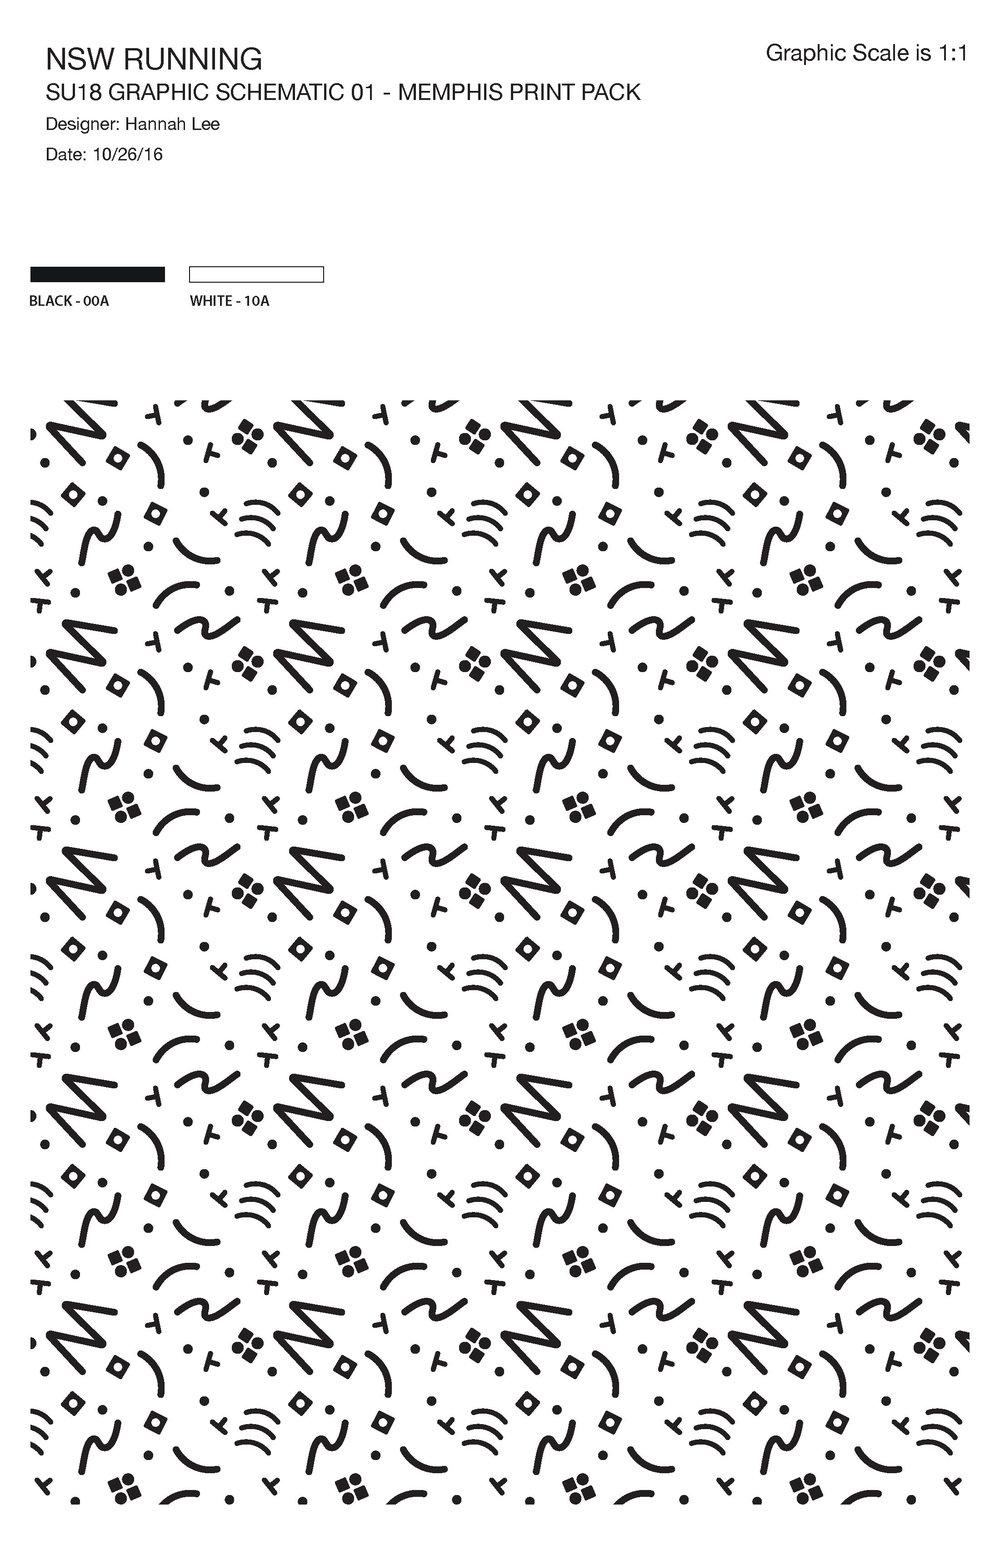 MEMPHIS_PACK_SU18_RUNNING_Page_1.jpg